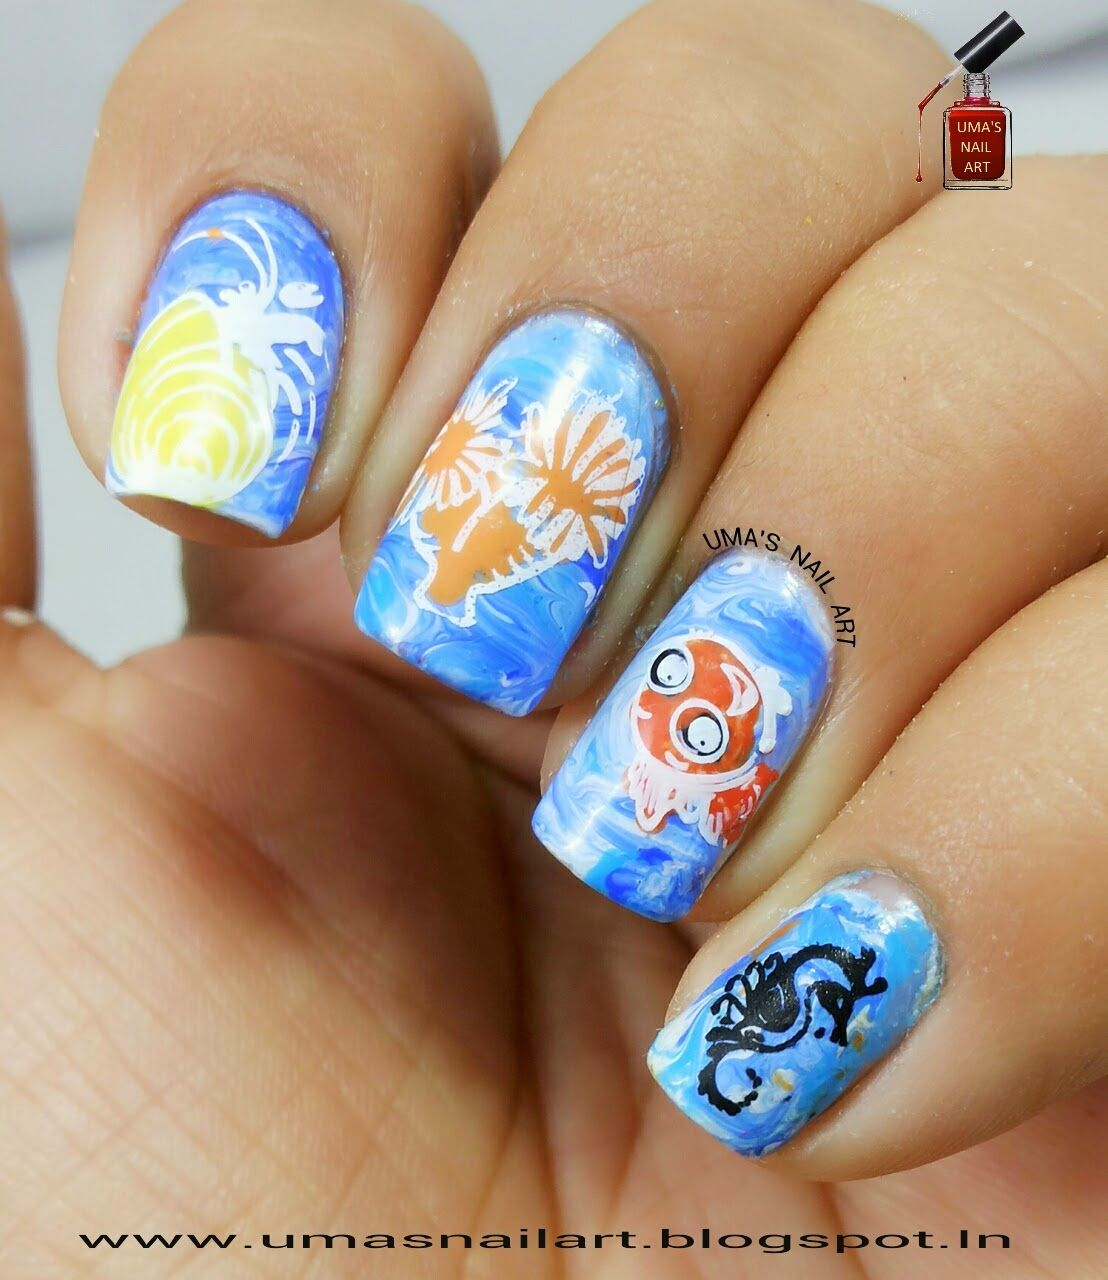 Uma's Nail Art: Day-12: Film..Finding Nemo www.umasnailart.blogspot.in